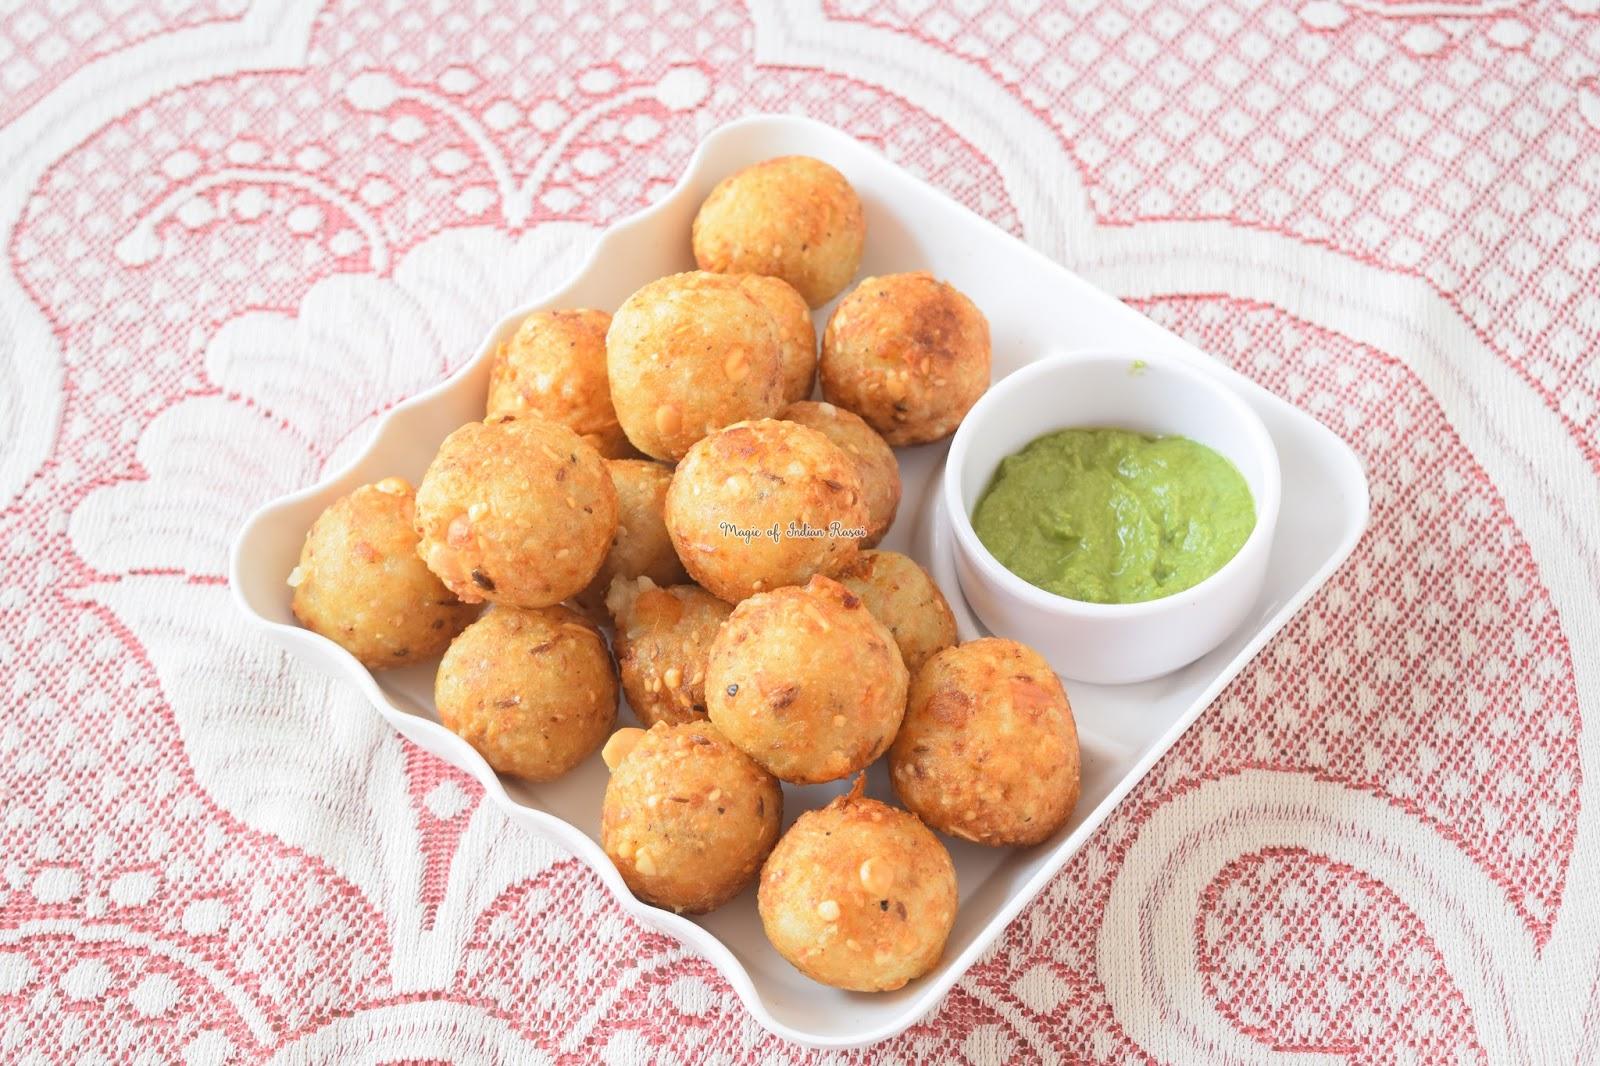 Sabudana Na Gota (Vrat Special) Recipe - साबूदाना के गोटे (व्रत स्पेशल) रेसिपी - Priya R - Magic of Indian Rasoi